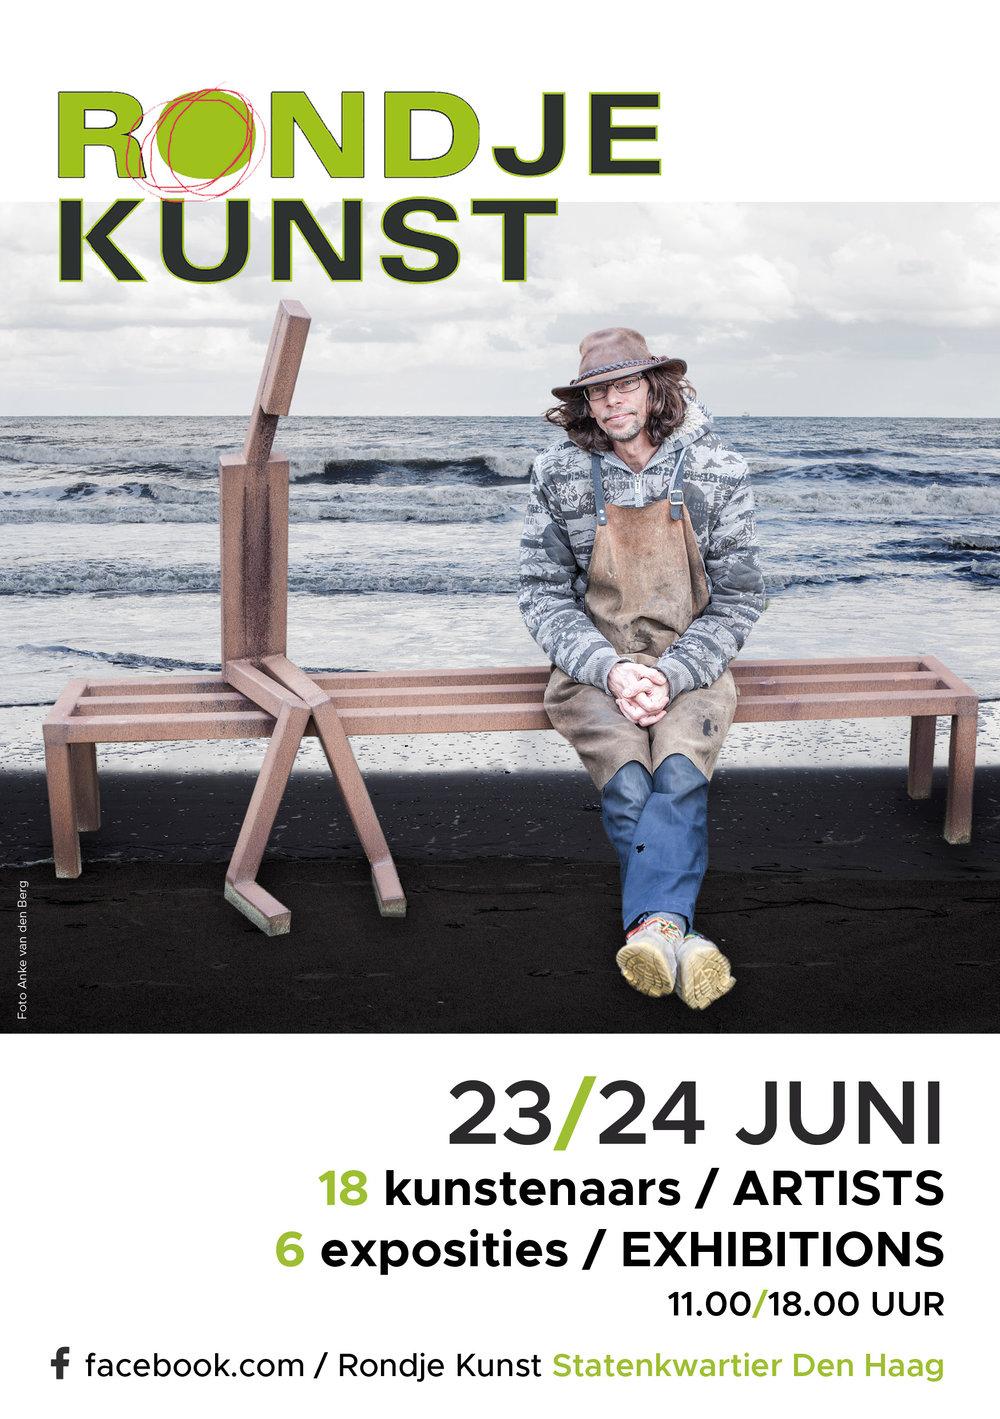 Poster Rondje kunst 2018